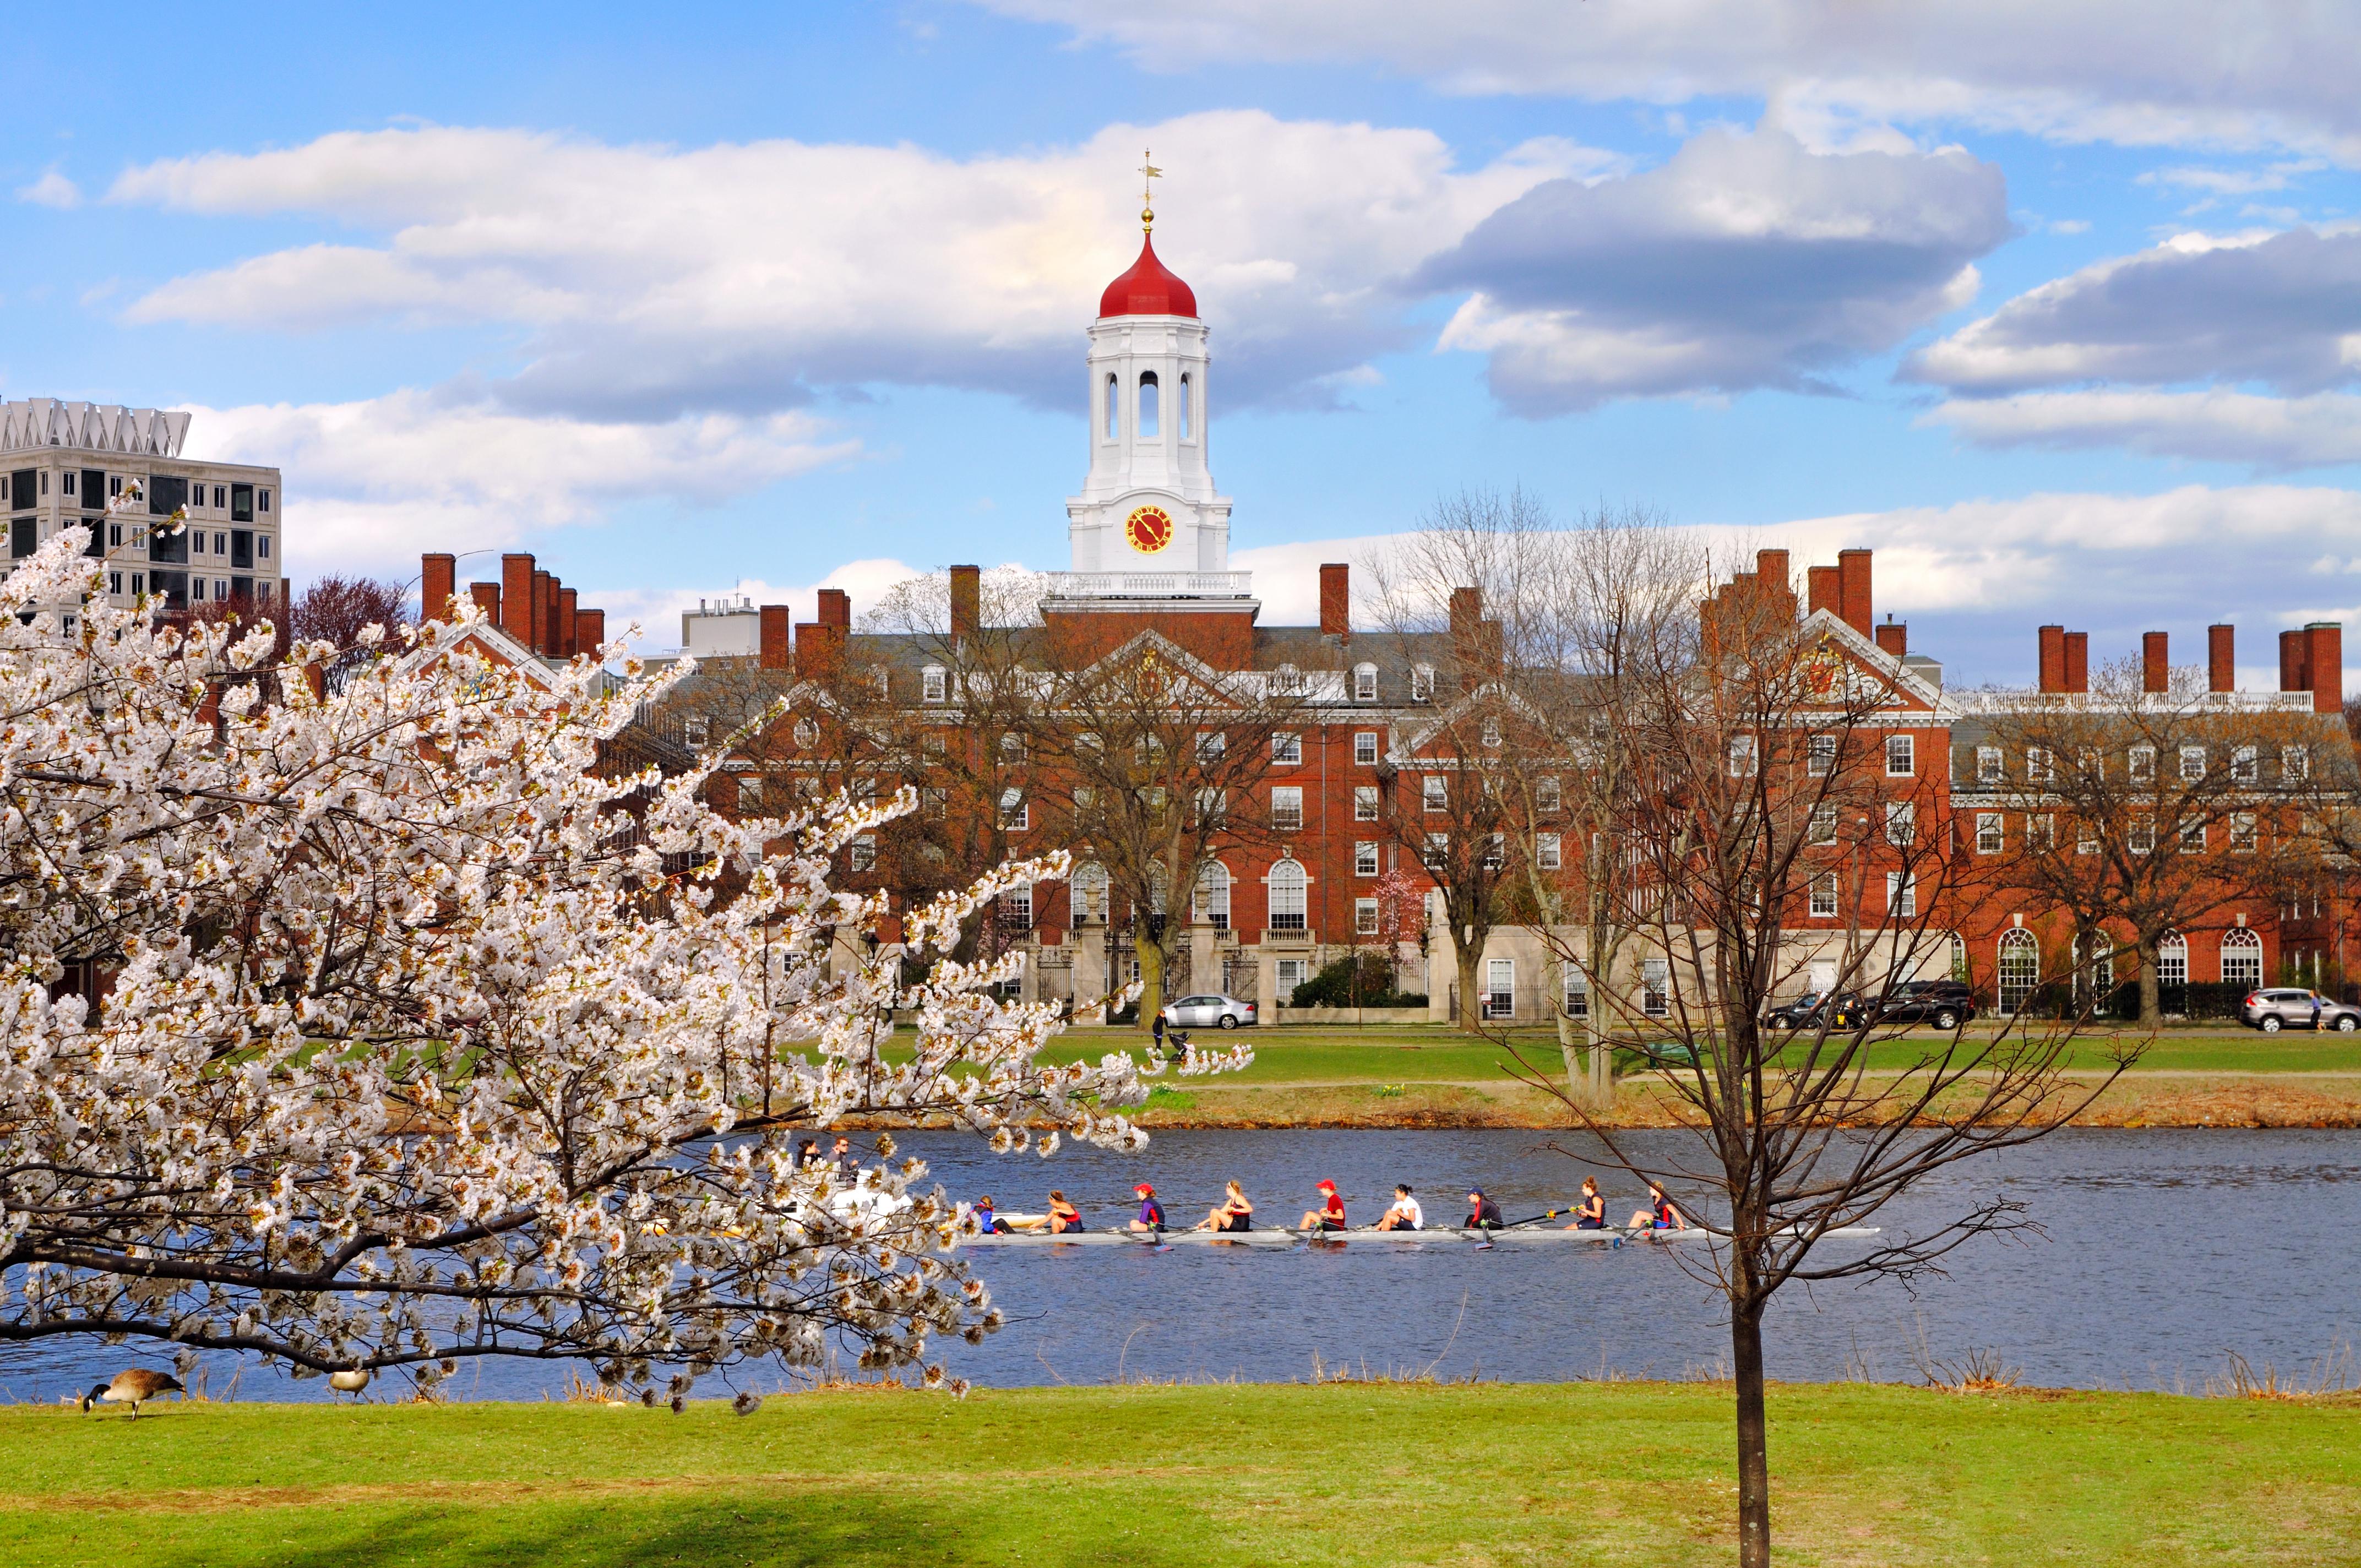 Boston - Charles River Rowing